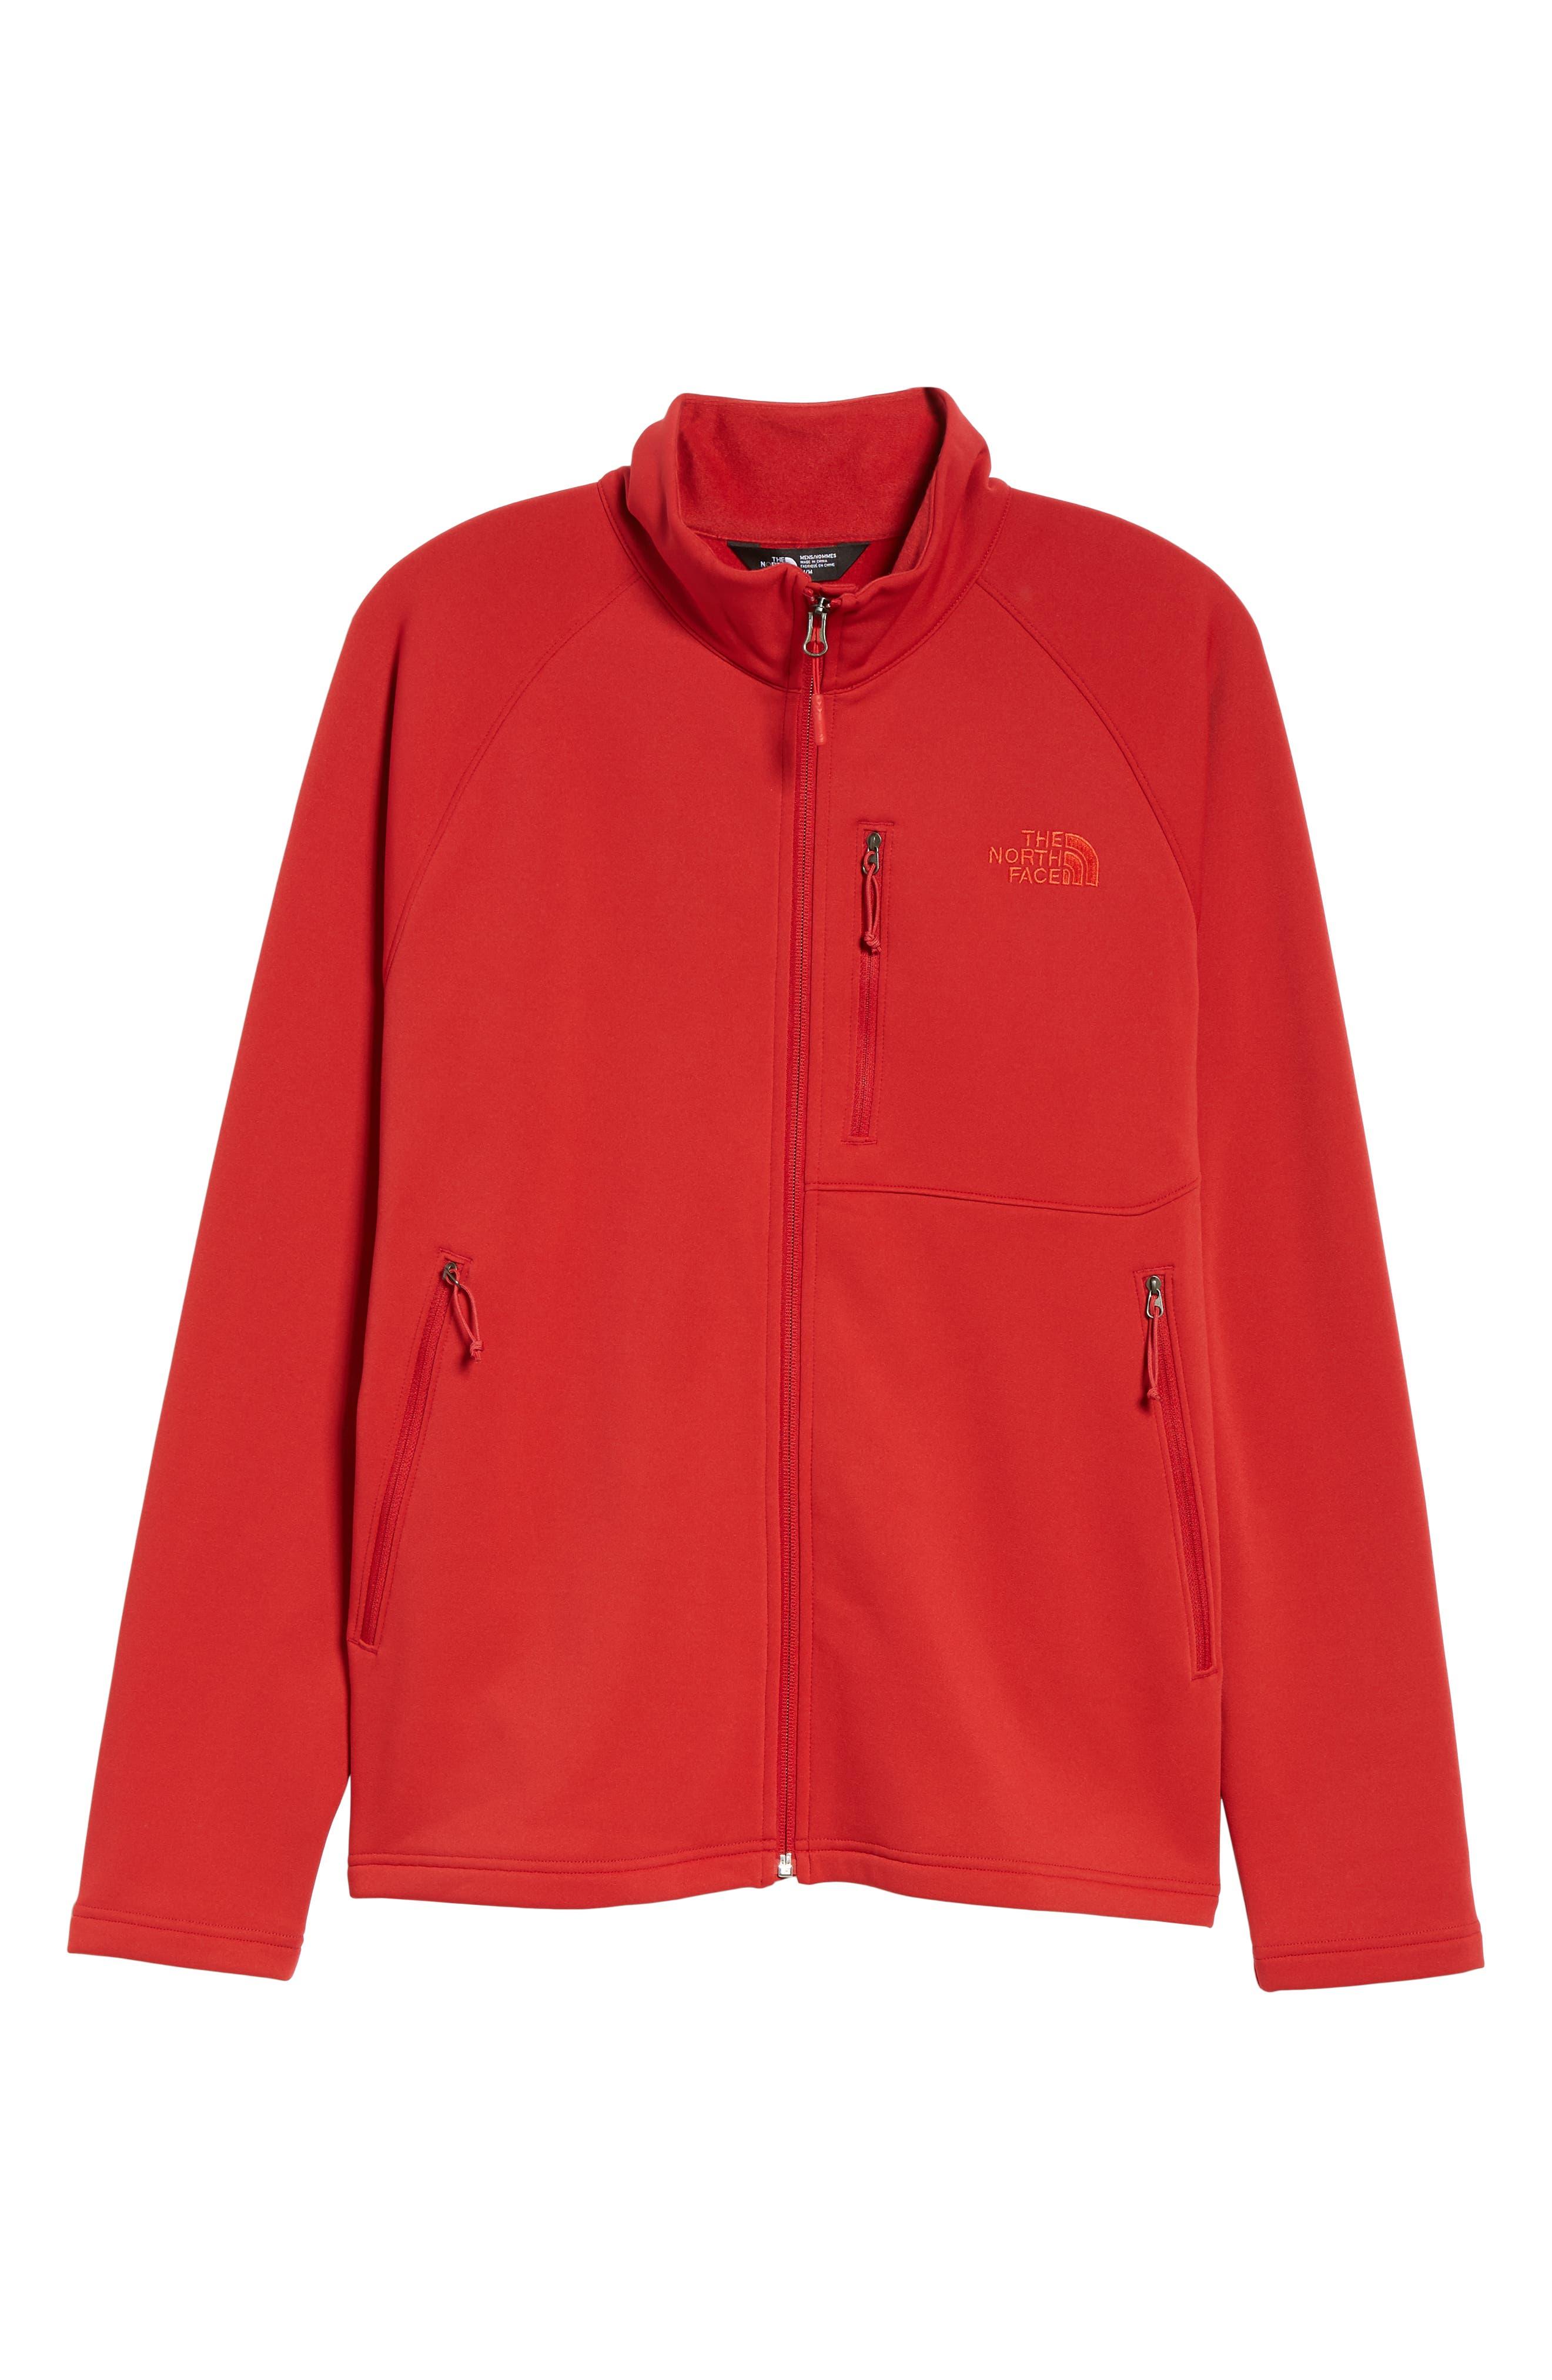 Tenacious Zip Jacket,                             Alternate thumbnail 5, color,                             RAGE RED